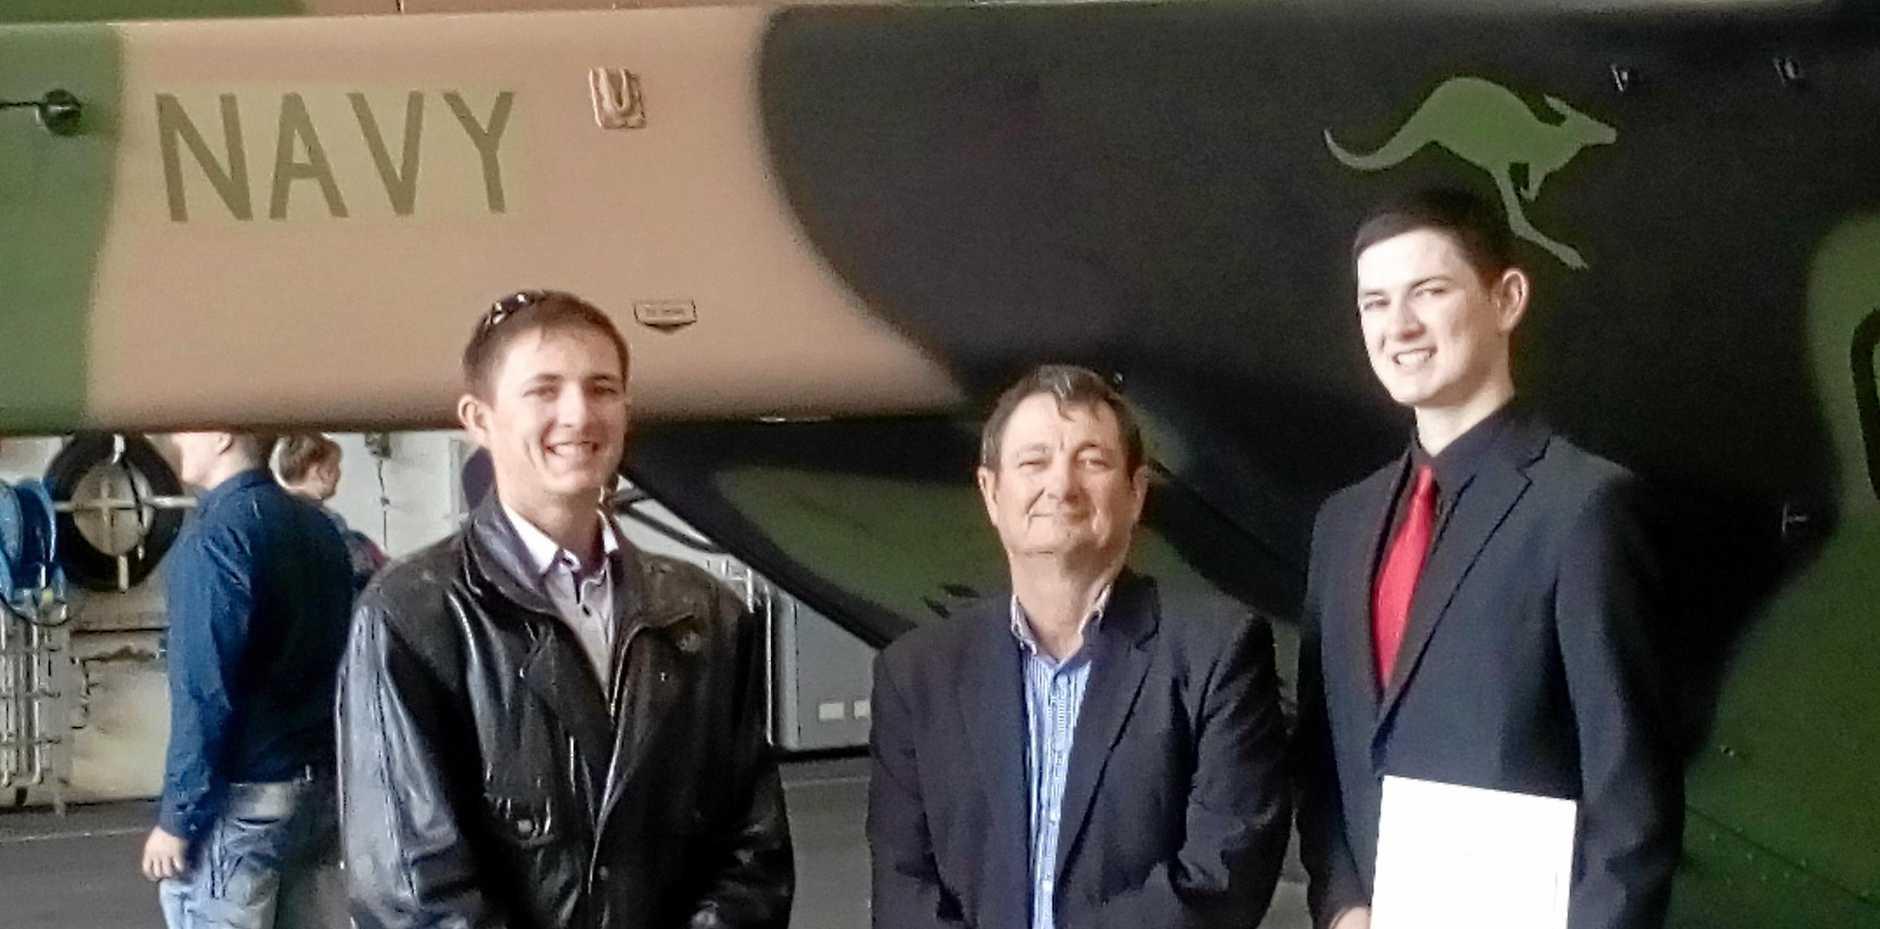 FAMILY TIES: Adrian, 'Tex', and Daniel Heuston at Daniel's enlistment ceremony.